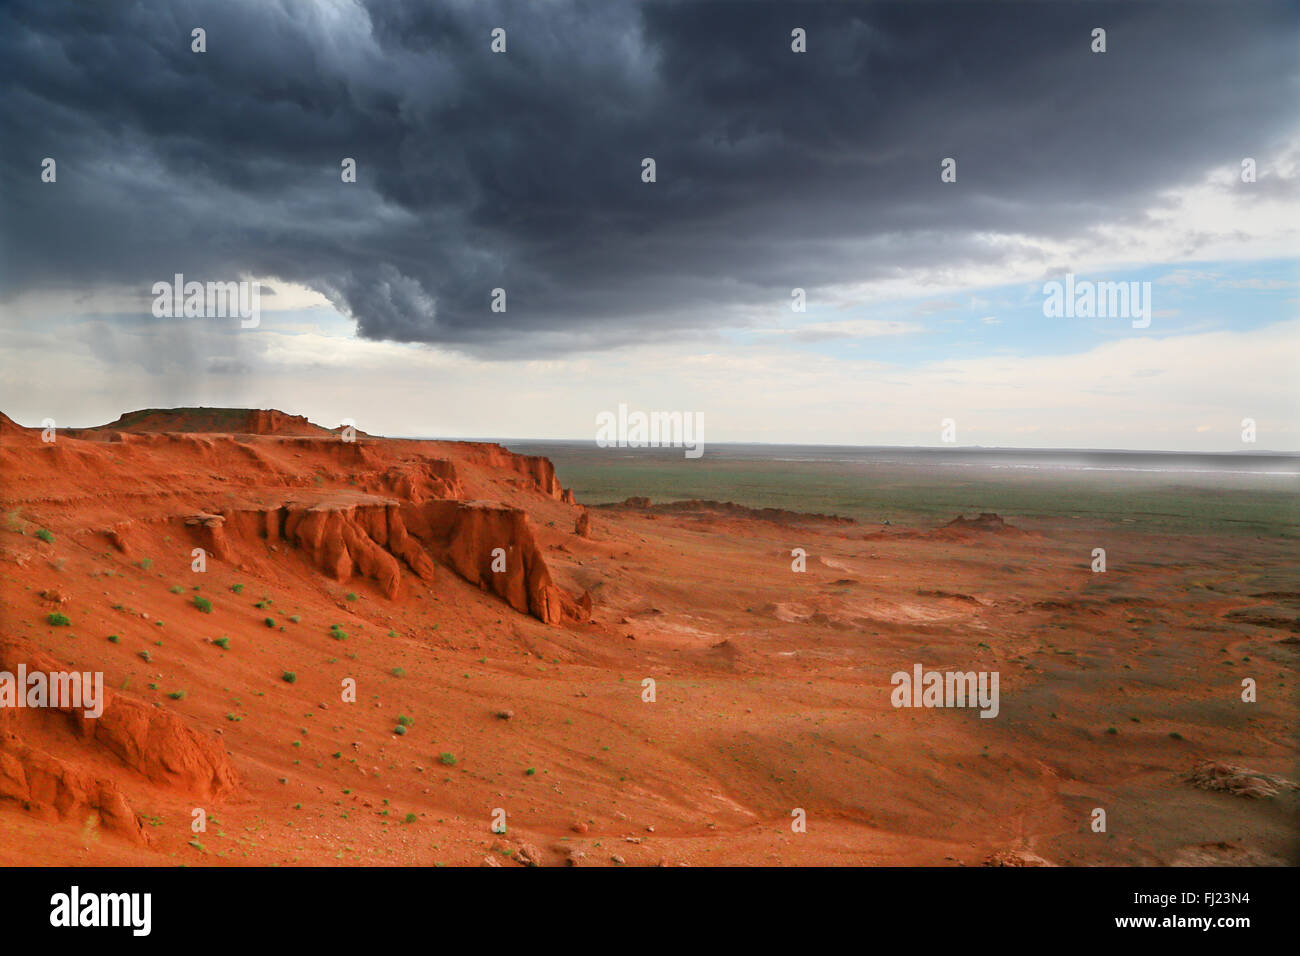 Mongolia landscape - the Bayanzag flaming cliffs - Stock Image